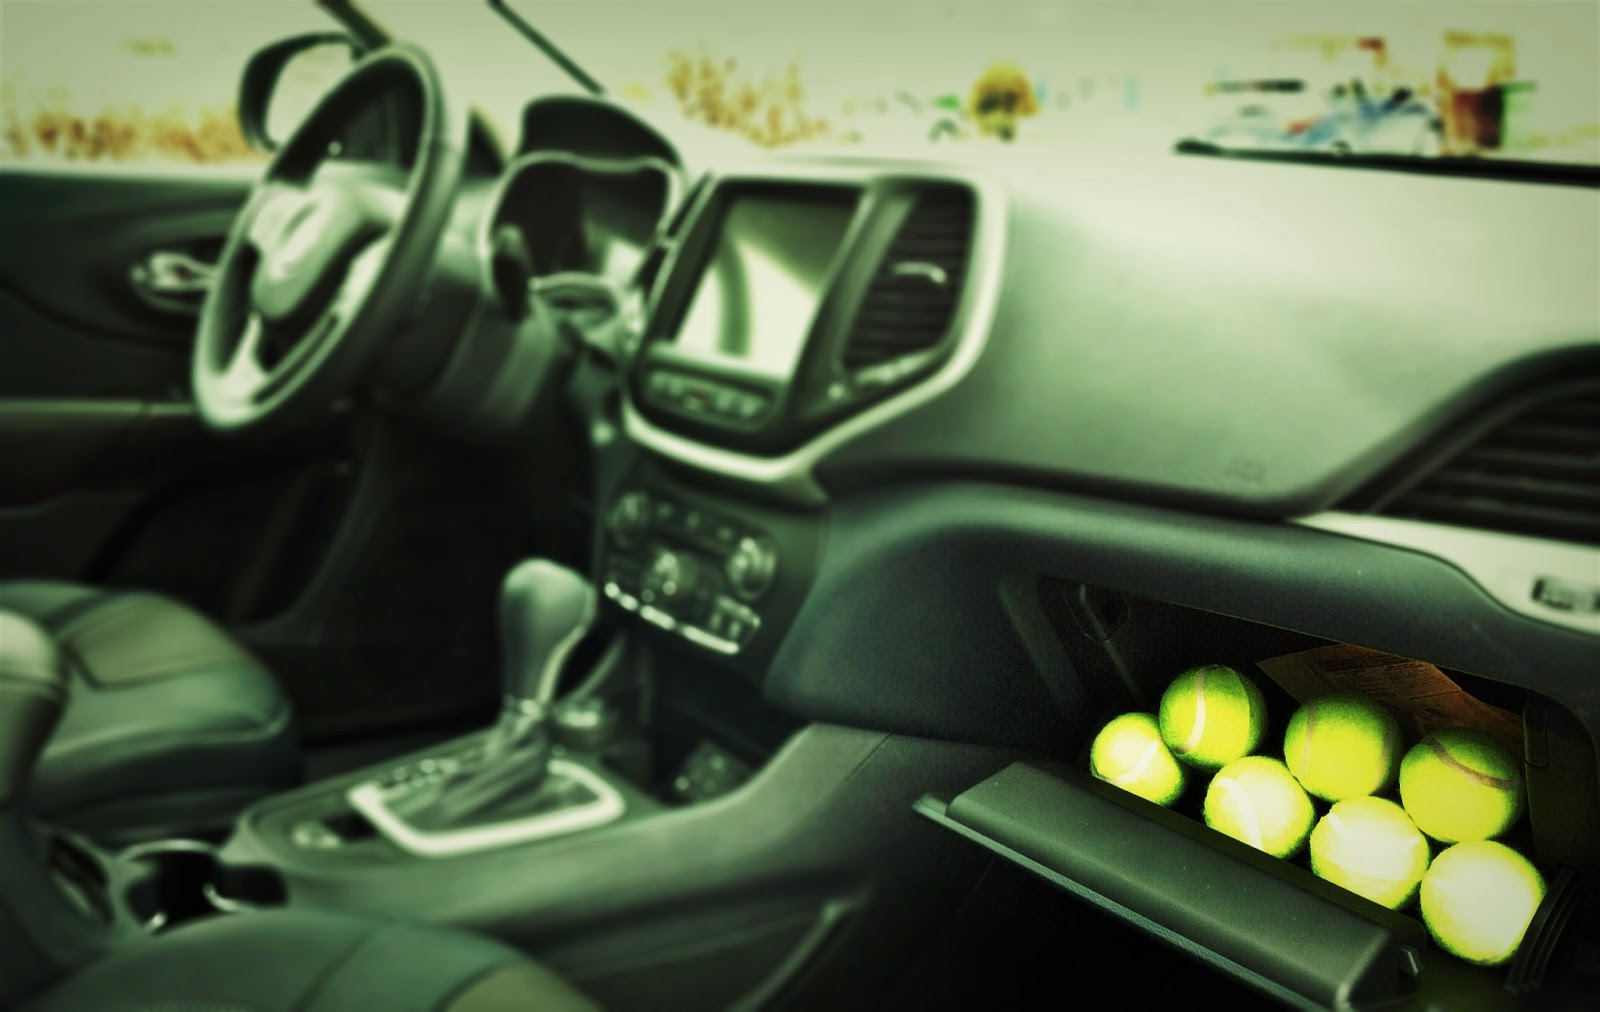 2014 Jeep Cherokee Limited interior